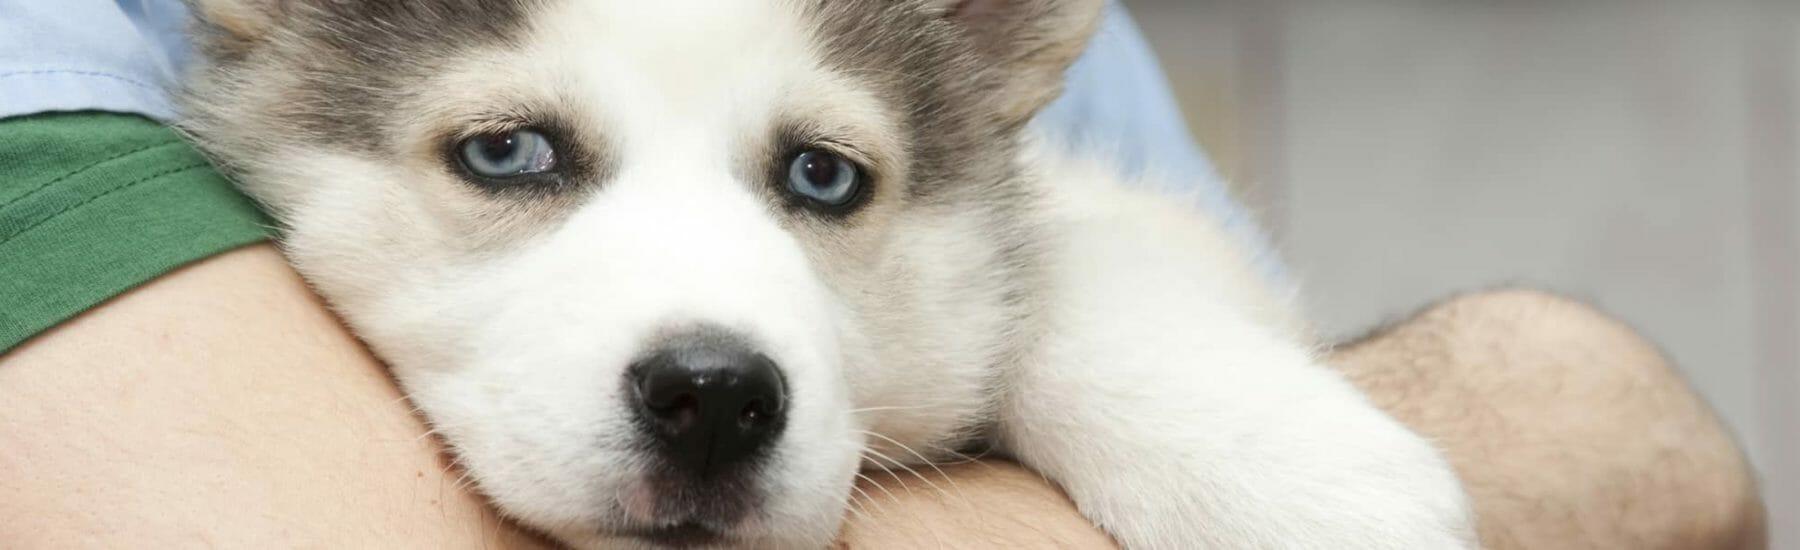 Small husky closeup looking at camera